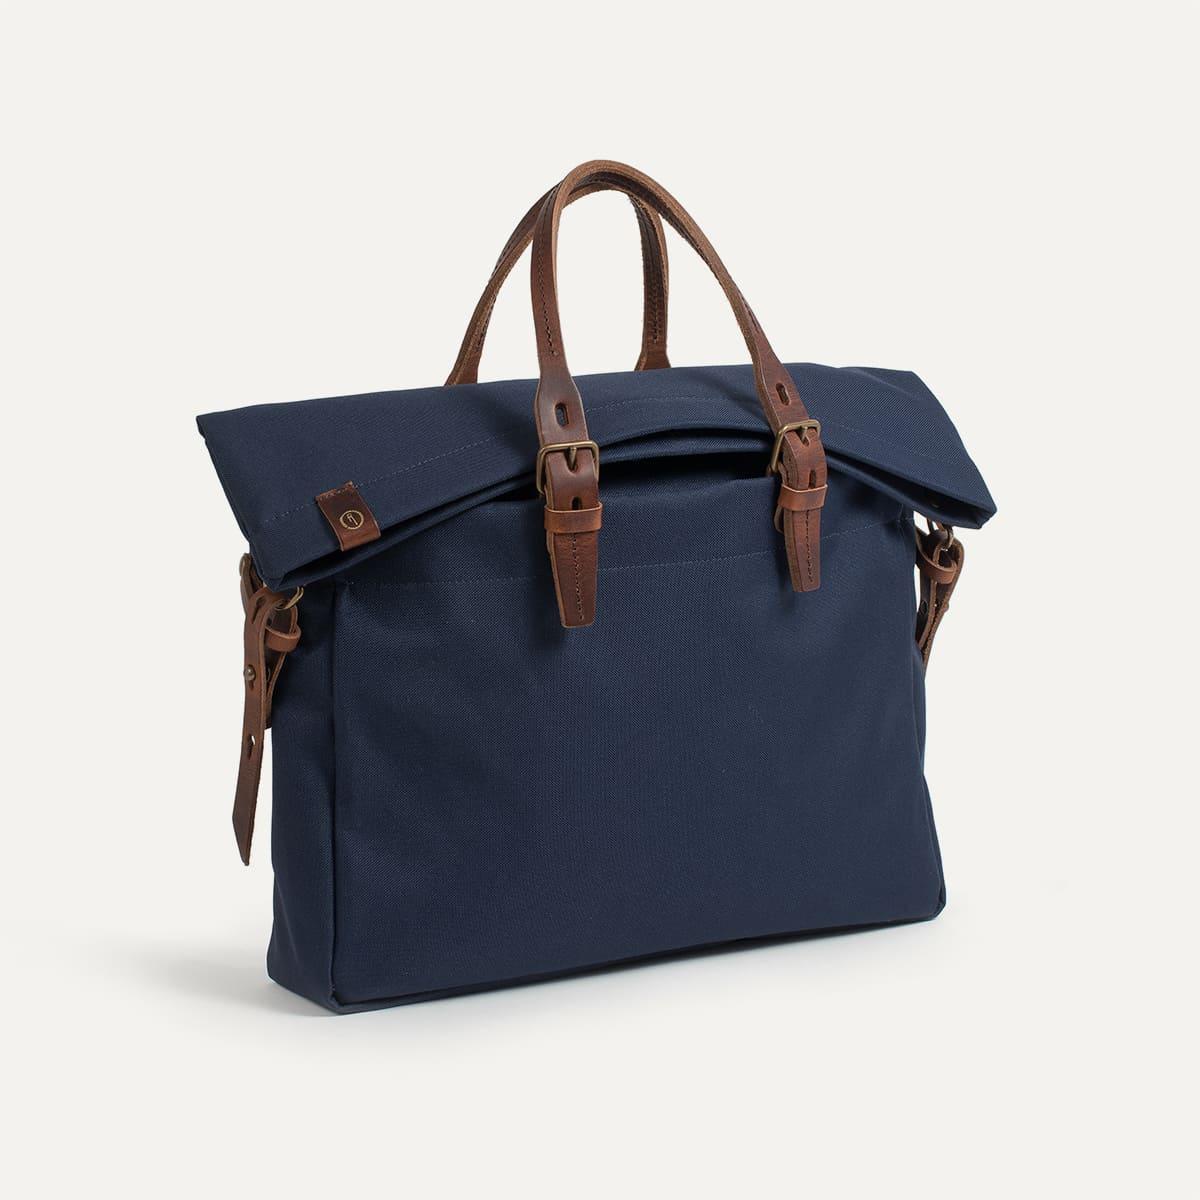 sac business homme remix marine bleu de chauffe. Black Bedroom Furniture Sets. Home Design Ideas